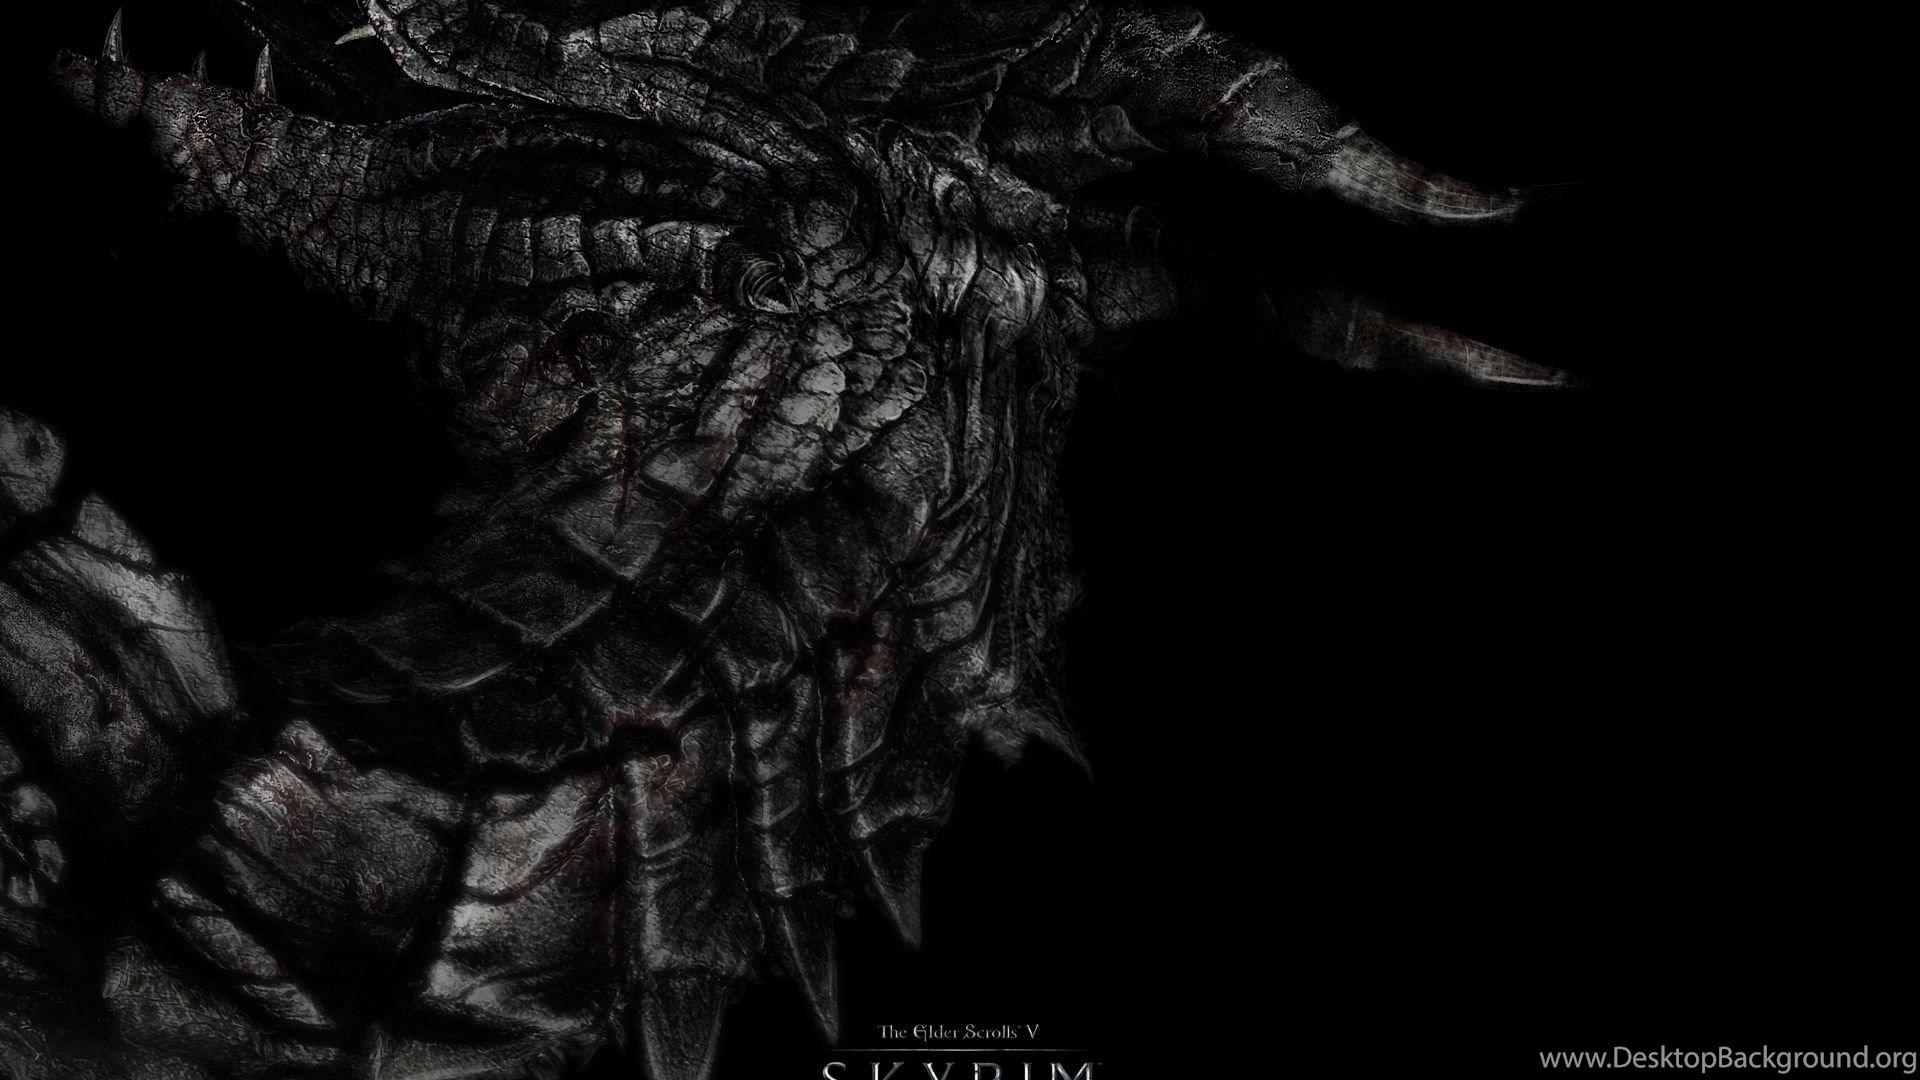 Download Wallpapers 1920x1080 Dragon Skyrim The Elder Scrolls V